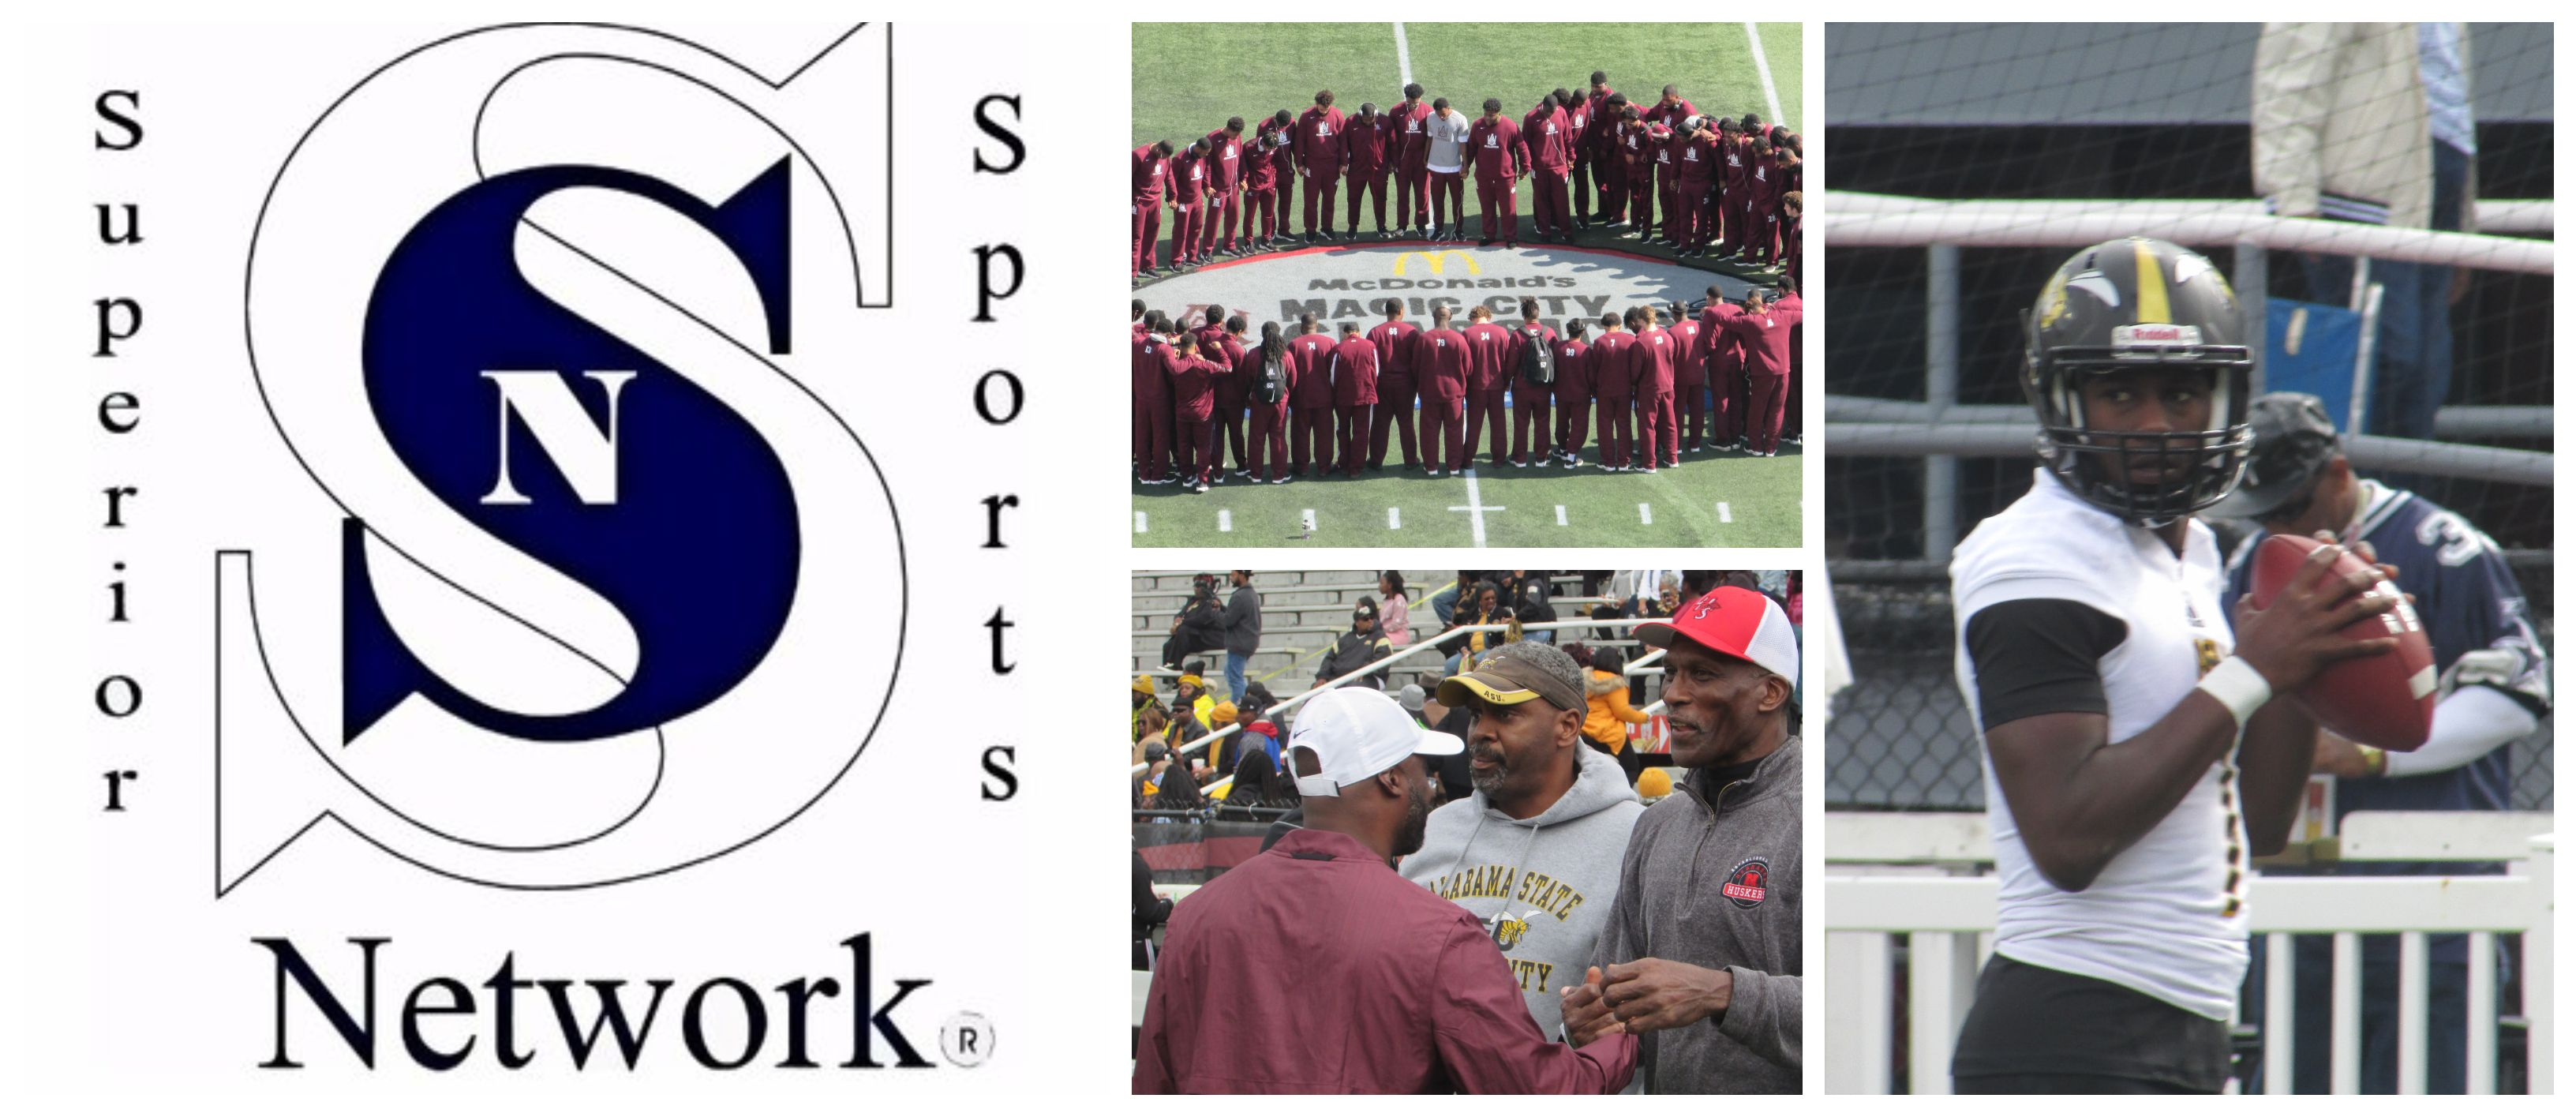 The Superior Sports Network Mcc 2018 Sports Baseball Cards Lululemon Logo